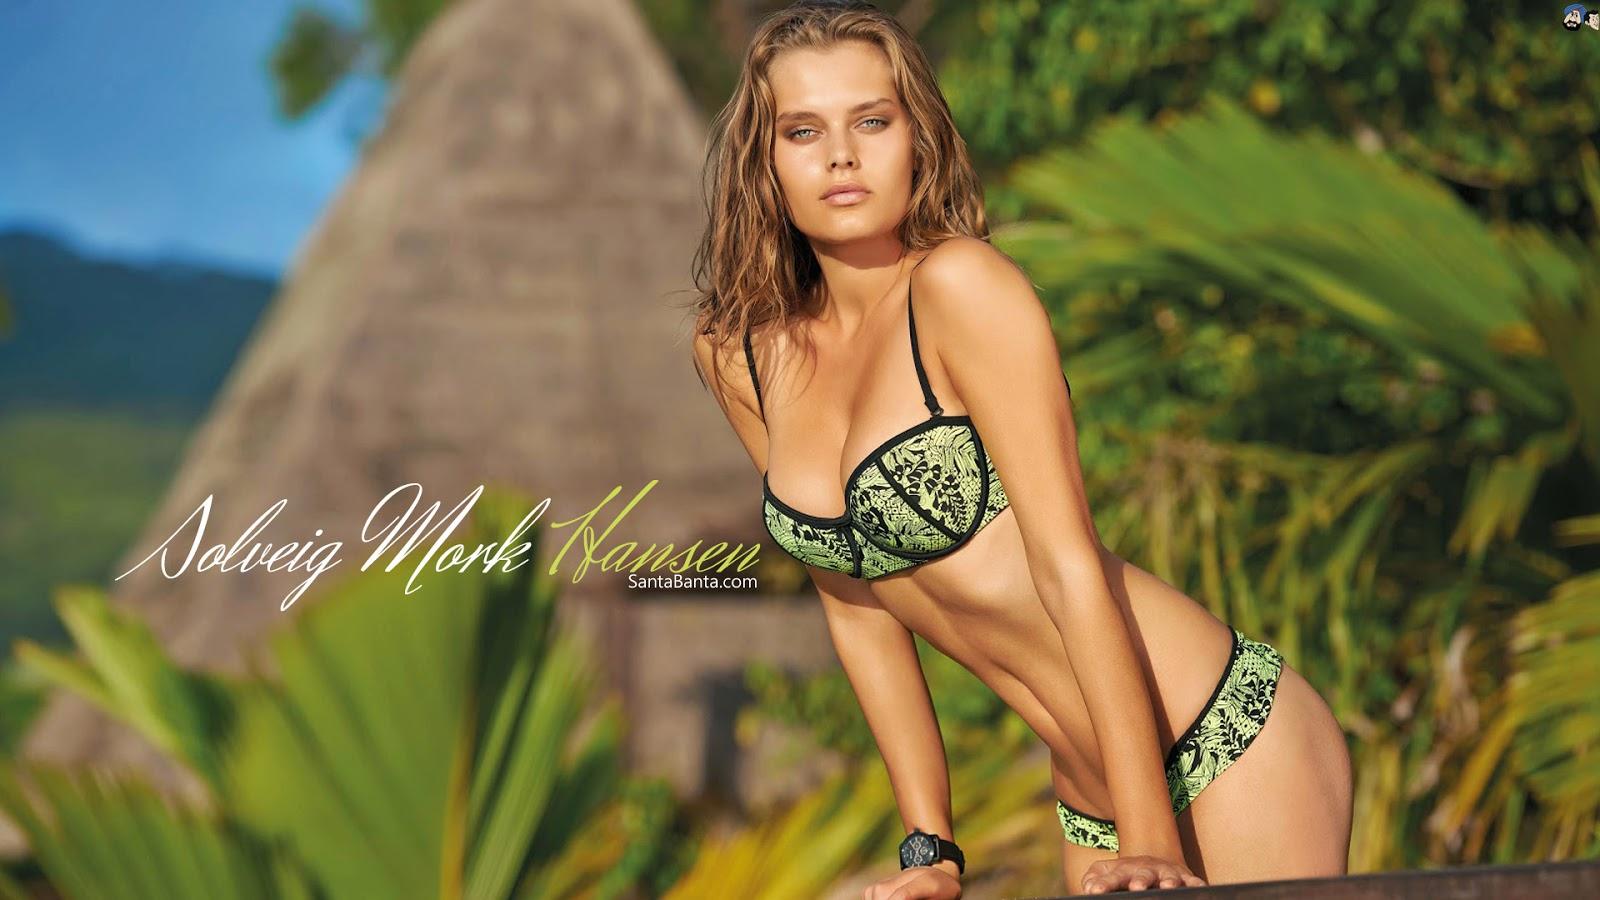 Butt Solveig Mork Hansen DEN nudes (63 pics) Topless, Snapchat, underwear